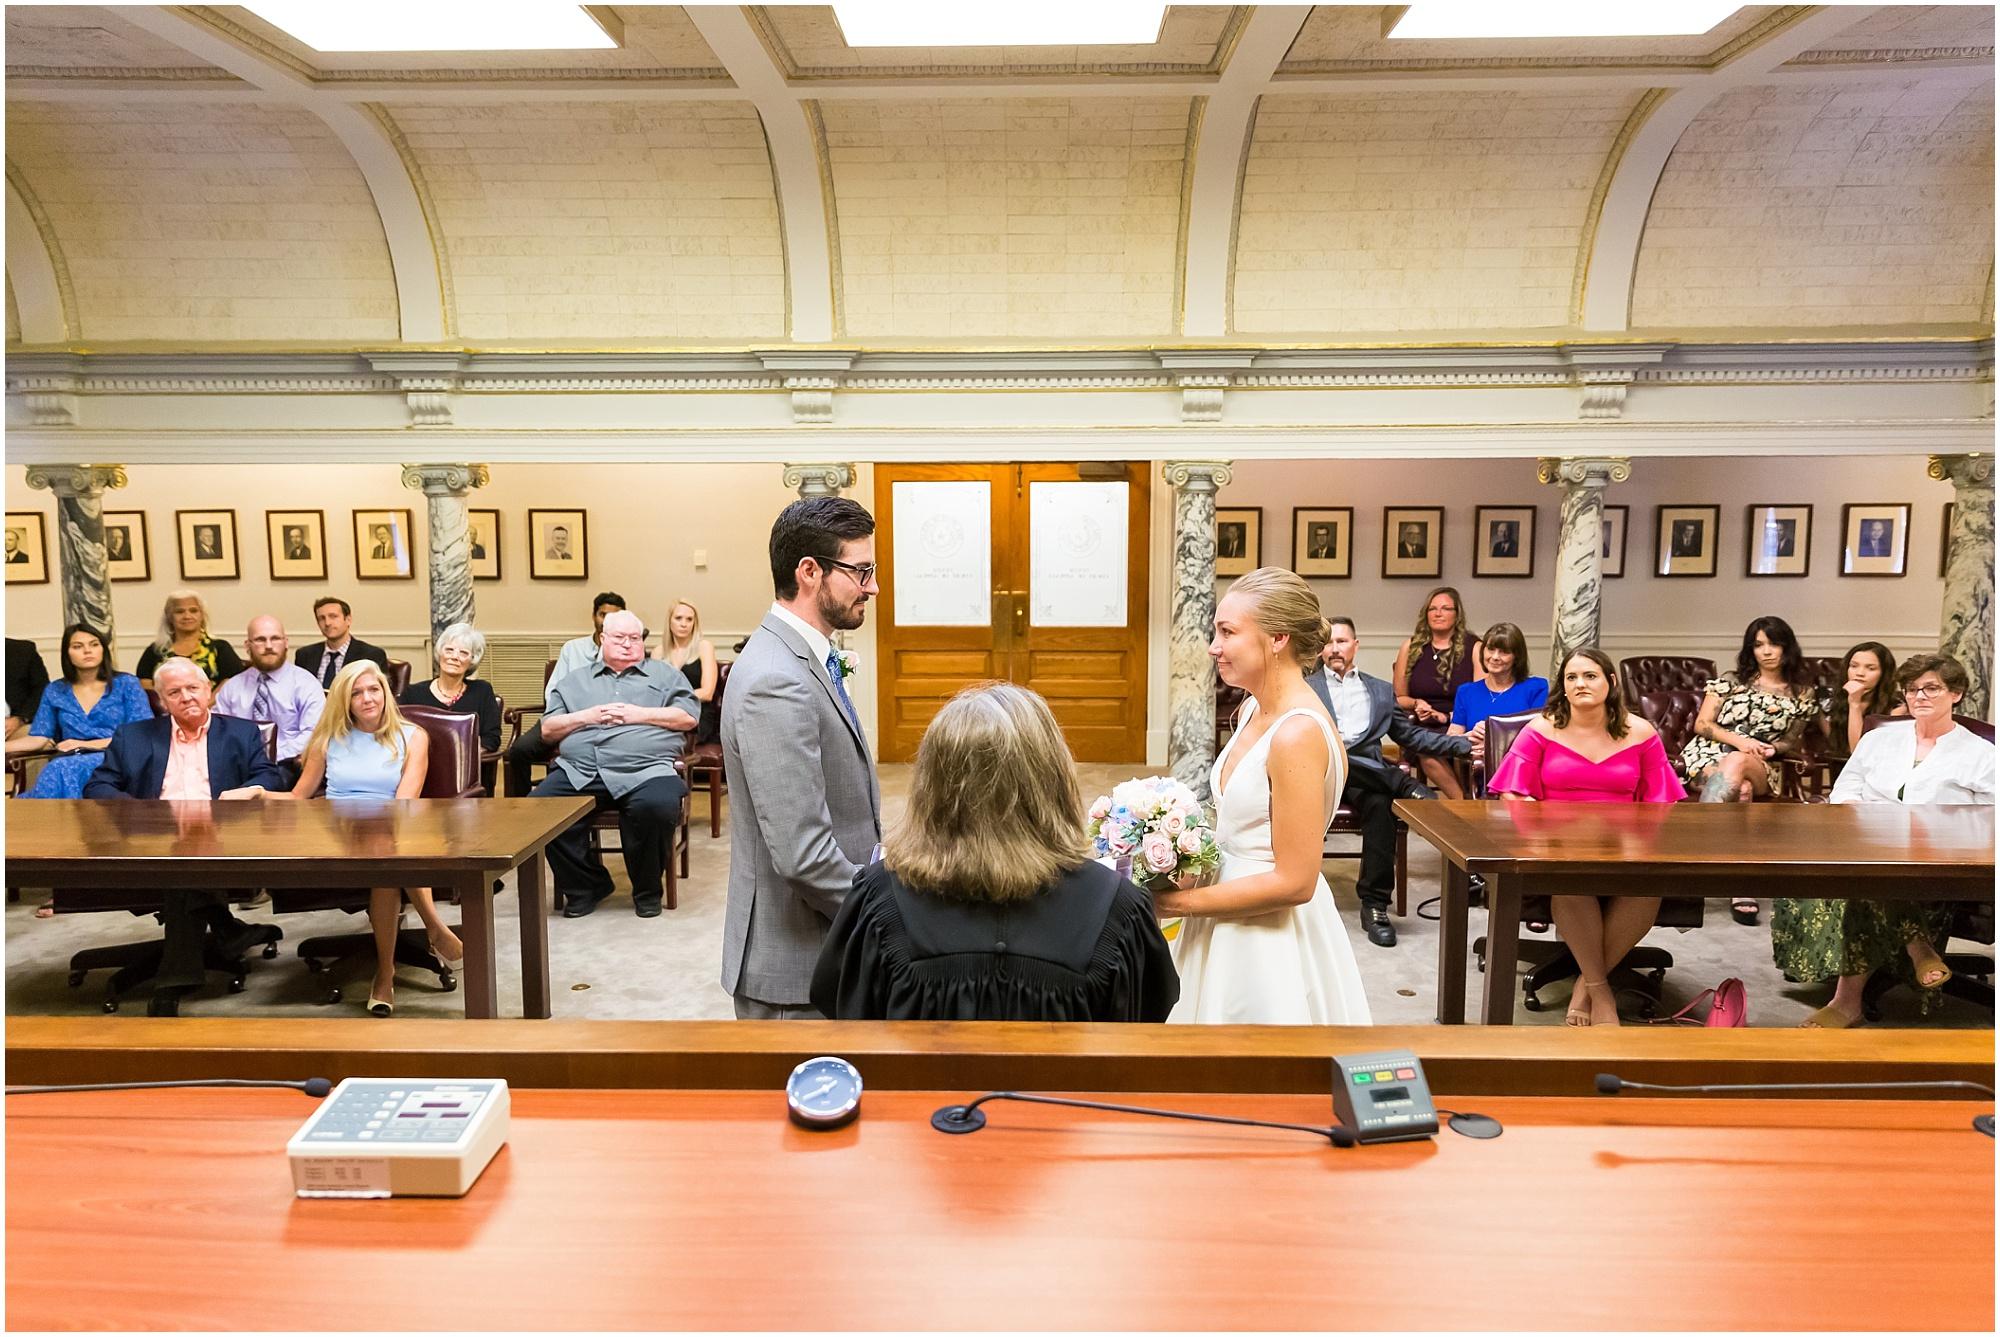 Courthouse-Wedding-Waco-Texas_0008.jpg